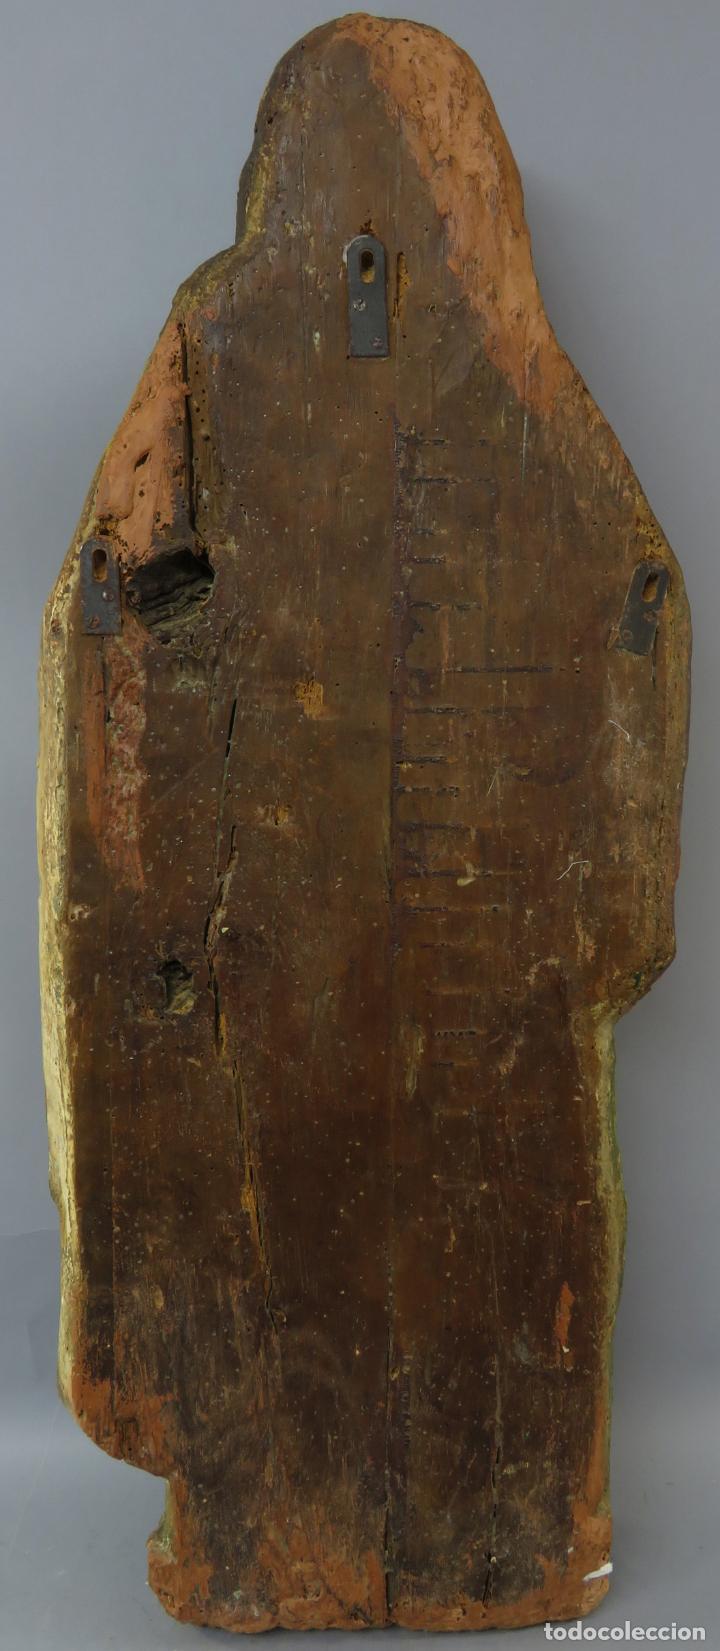 Arte: Talla de medio bulto o chuleta San Juan Evangelista madera tallada dorada y policromada XVI XVII - Foto 24 - 221922775